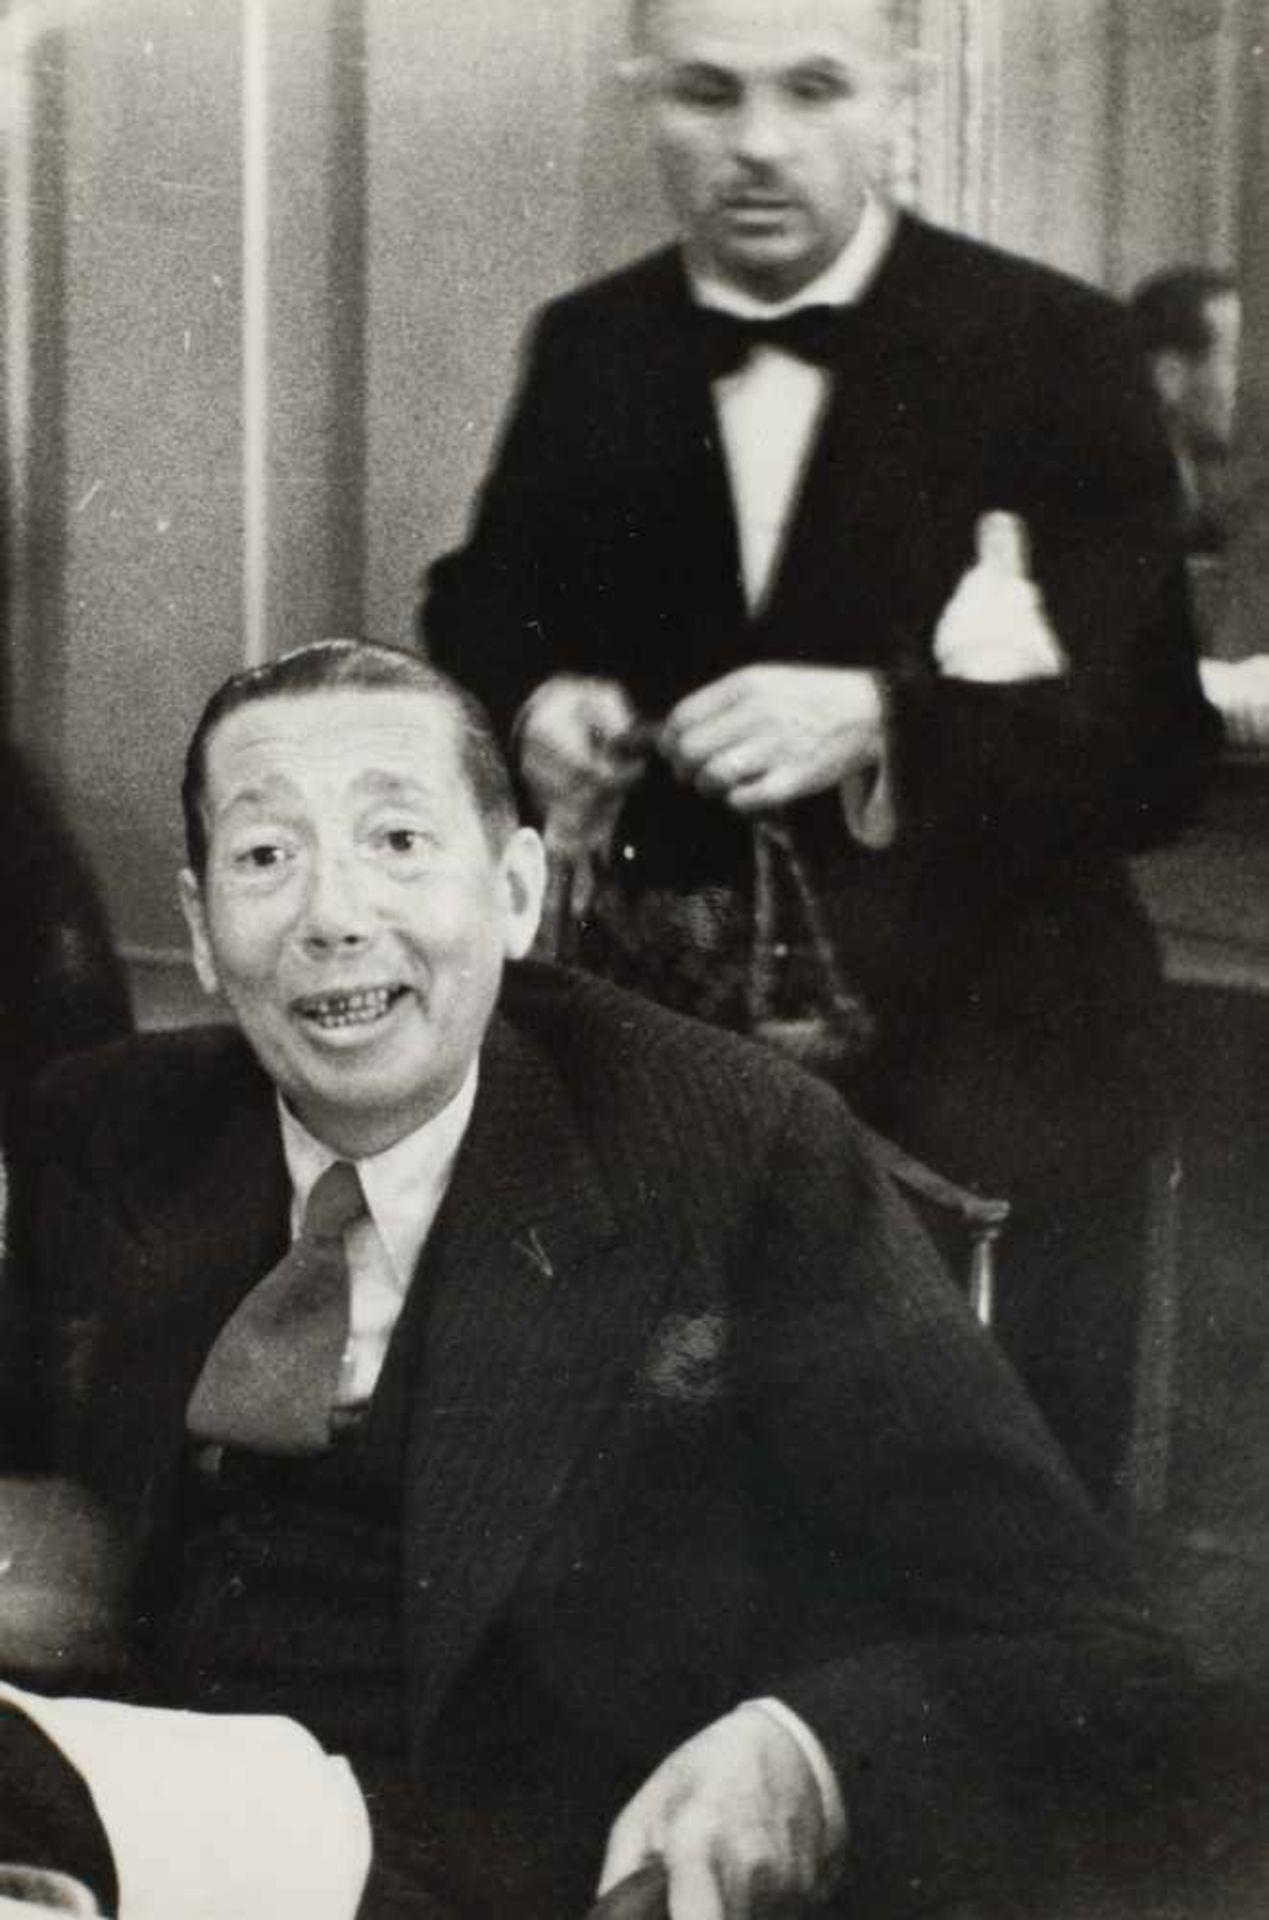 Seven photos illustrating Nicolae Titulescu, approx. 1940 - Bild 3 aus 8